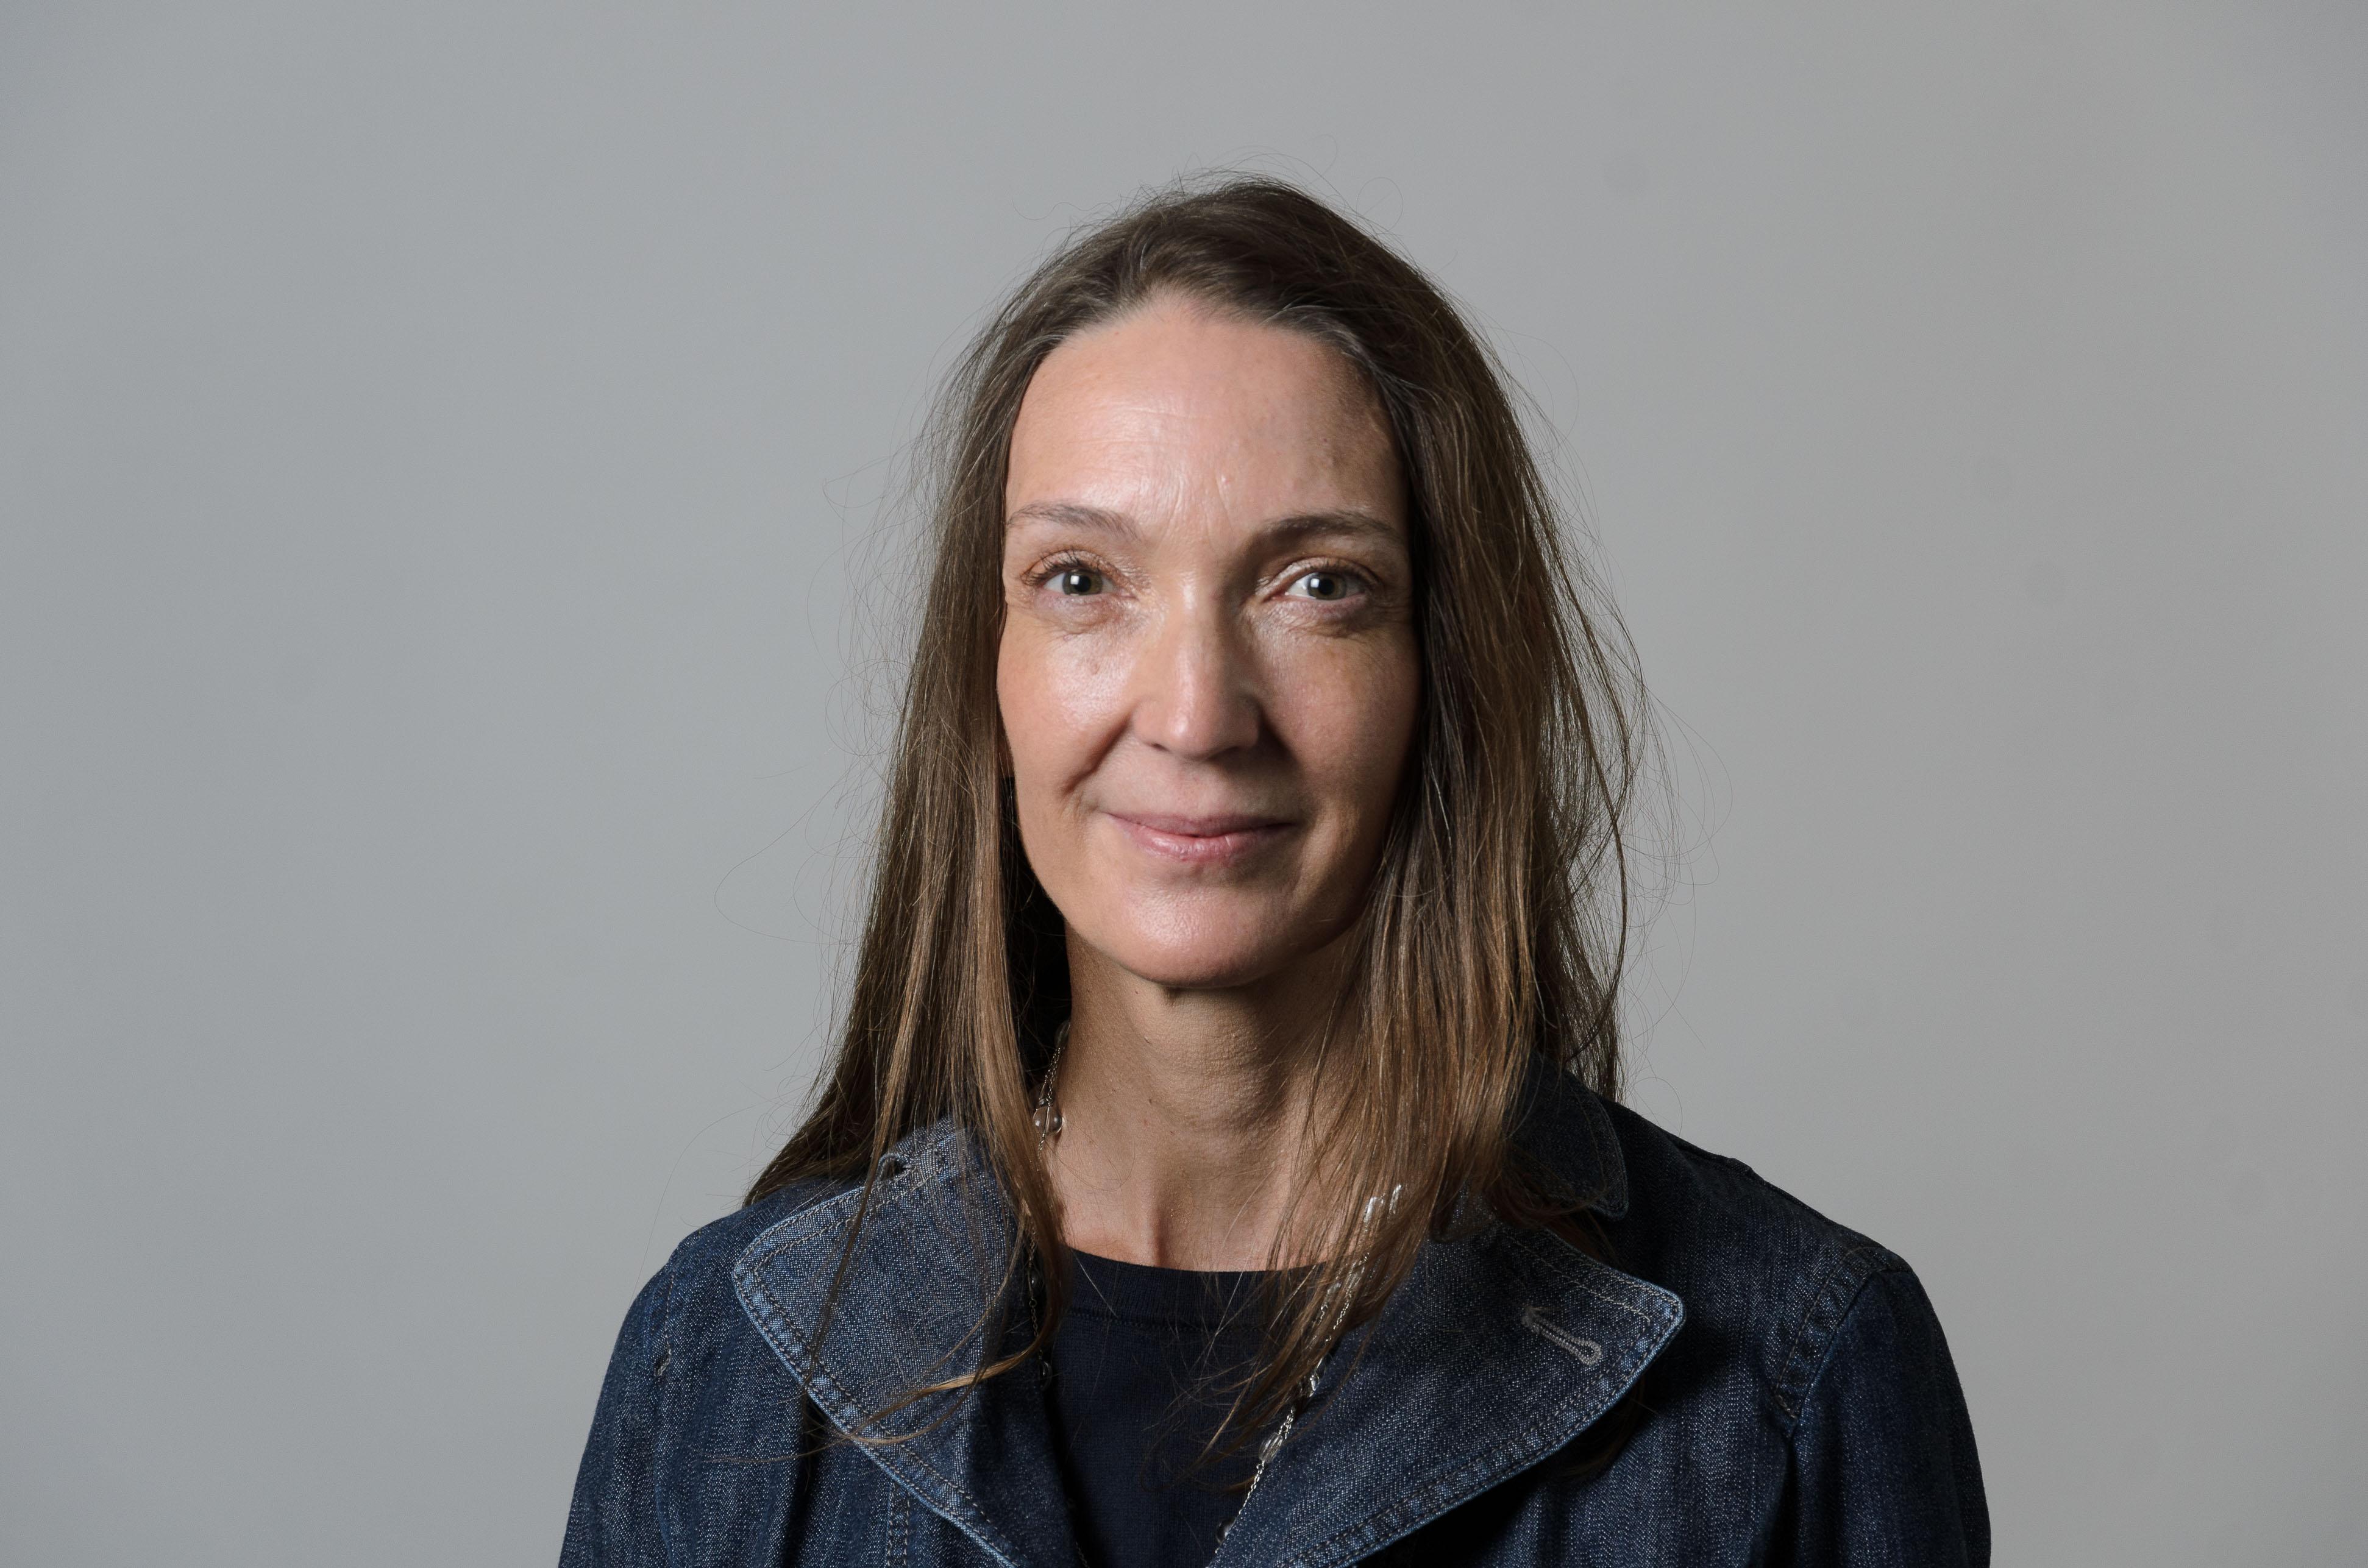 Kate Decker-Warm on Aug. 23, 2018. (Peter Morenus/UConn Photo)